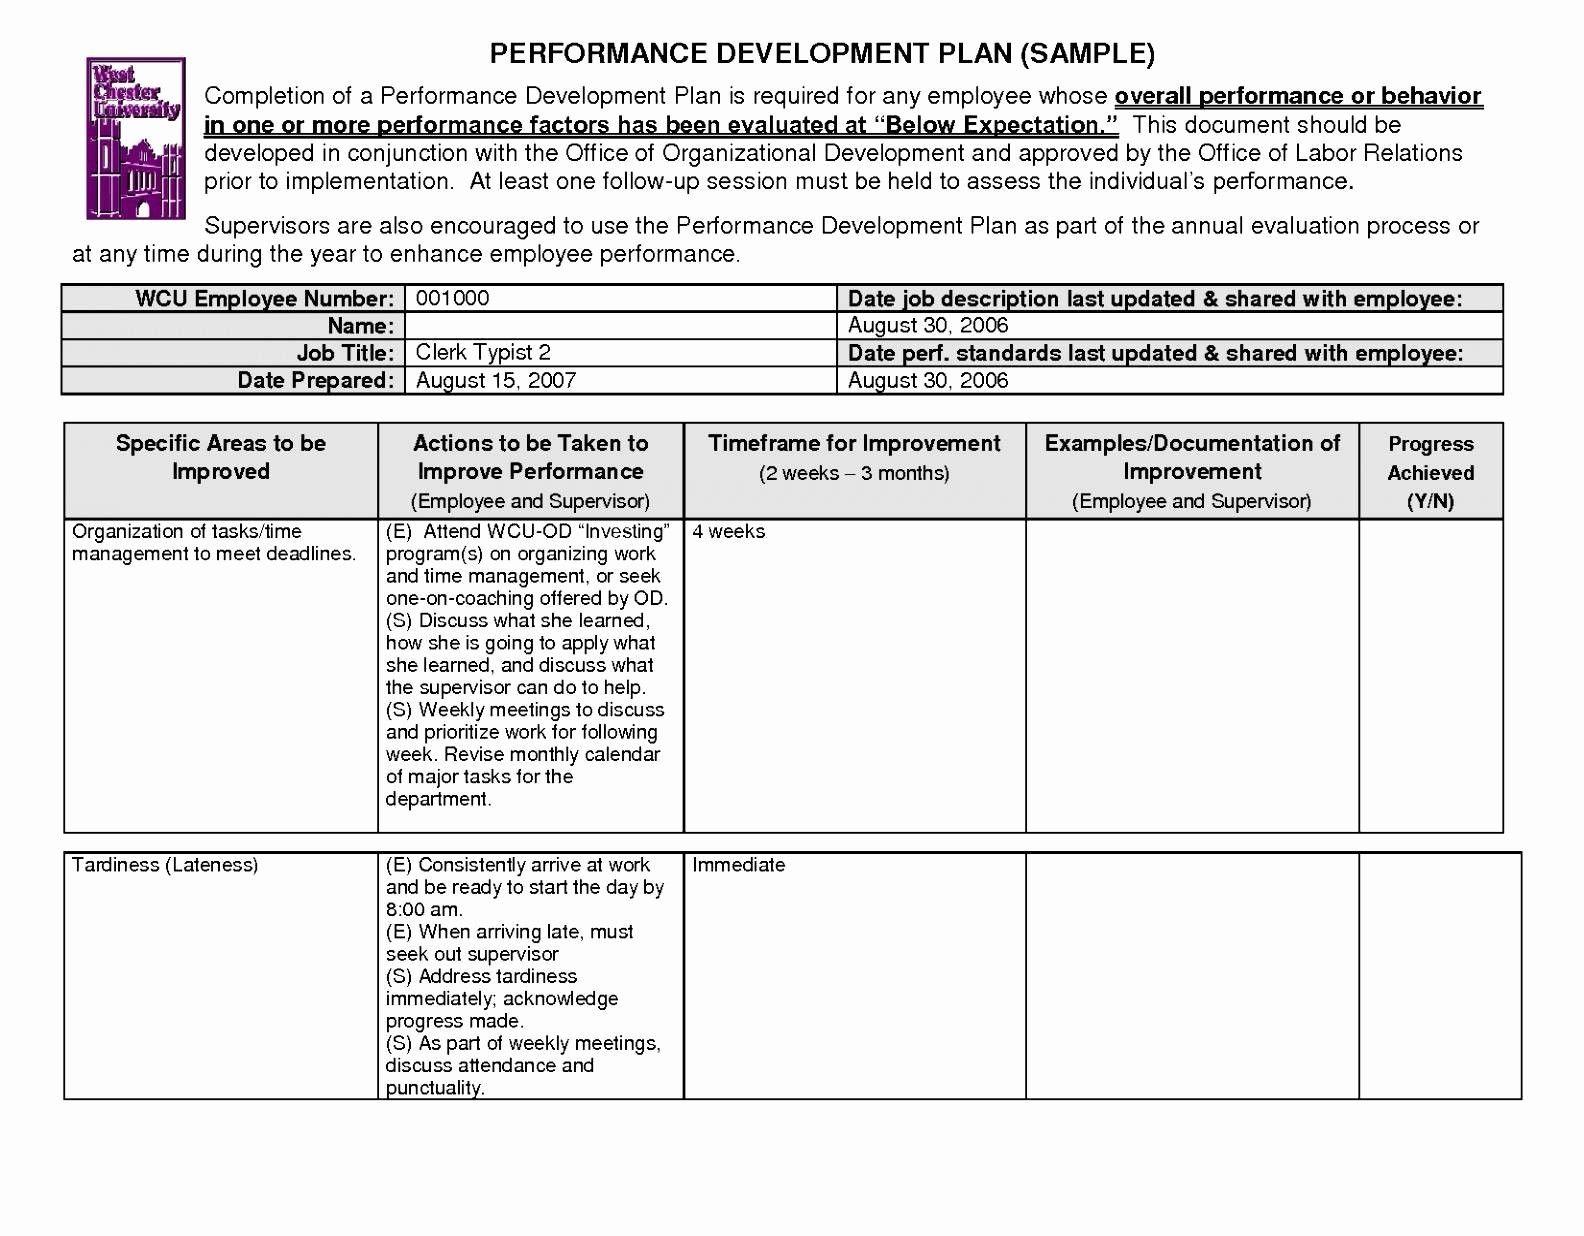 New Business Startup Spreadsheet Template Exceltemplate Xls Xlstemplate Xlsformat Excelforma Business Proposal Template How To Plan Business Plan Template